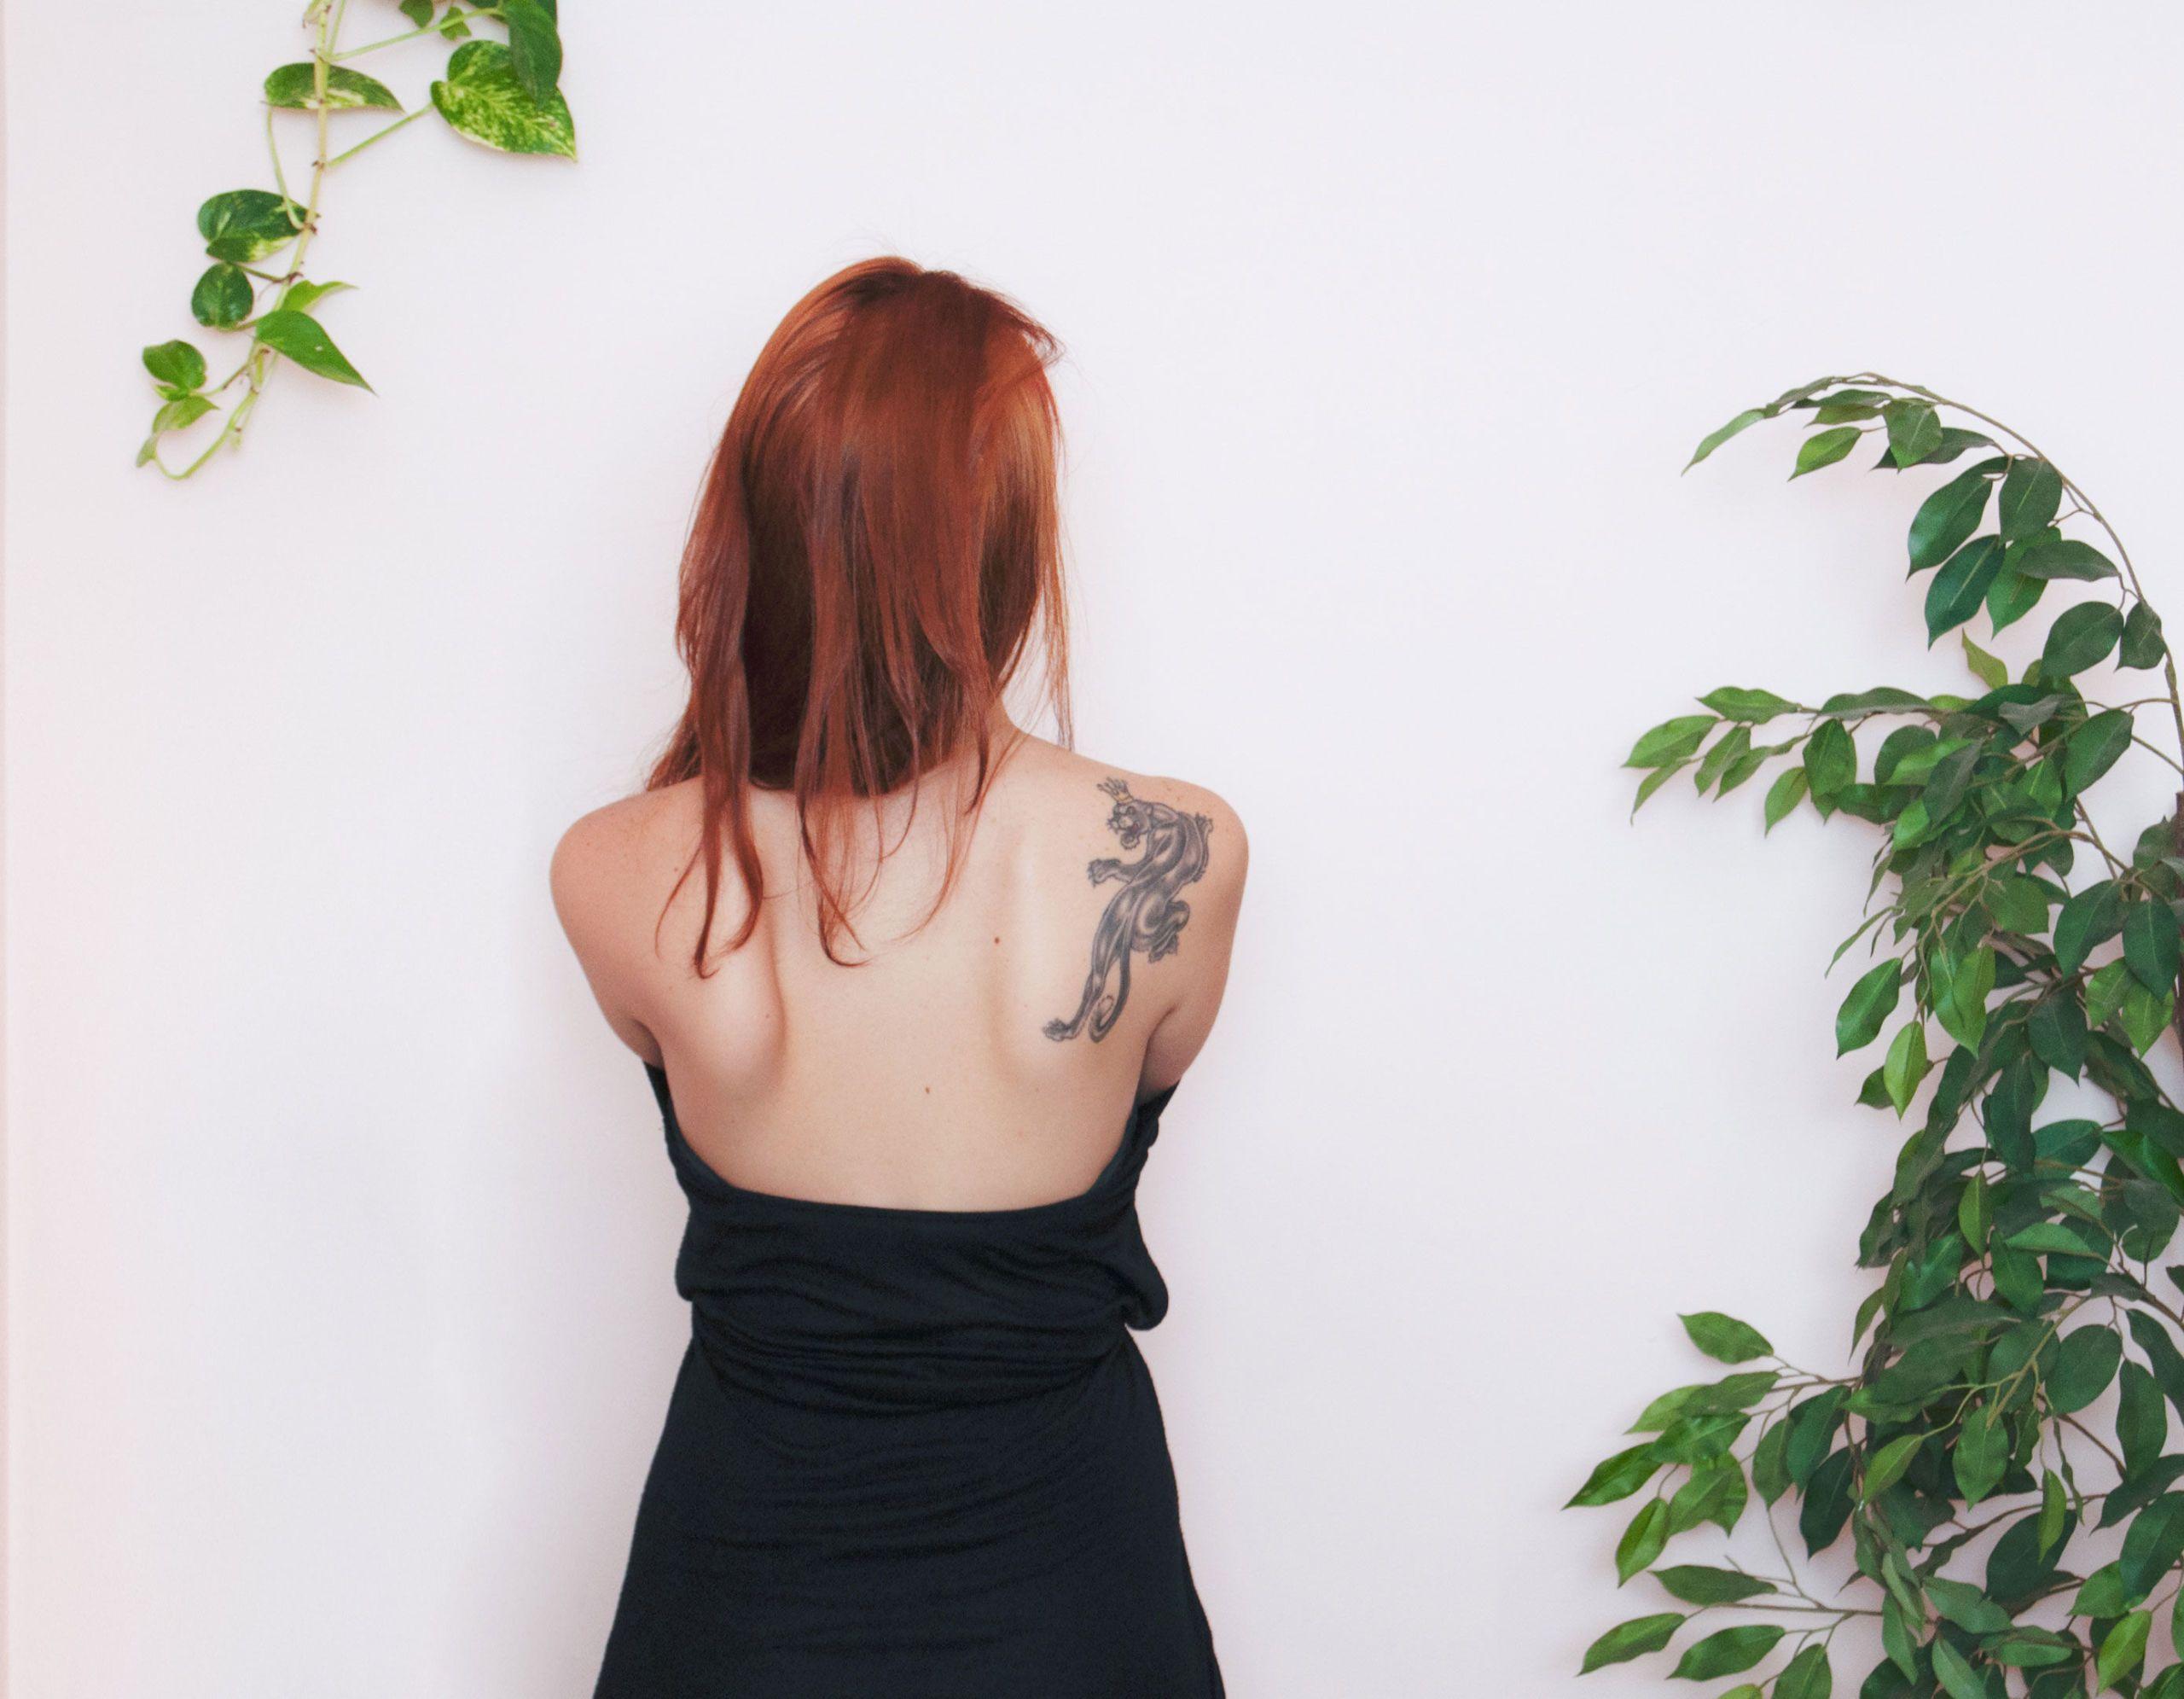 Ragazza nuda ragazza perfetta